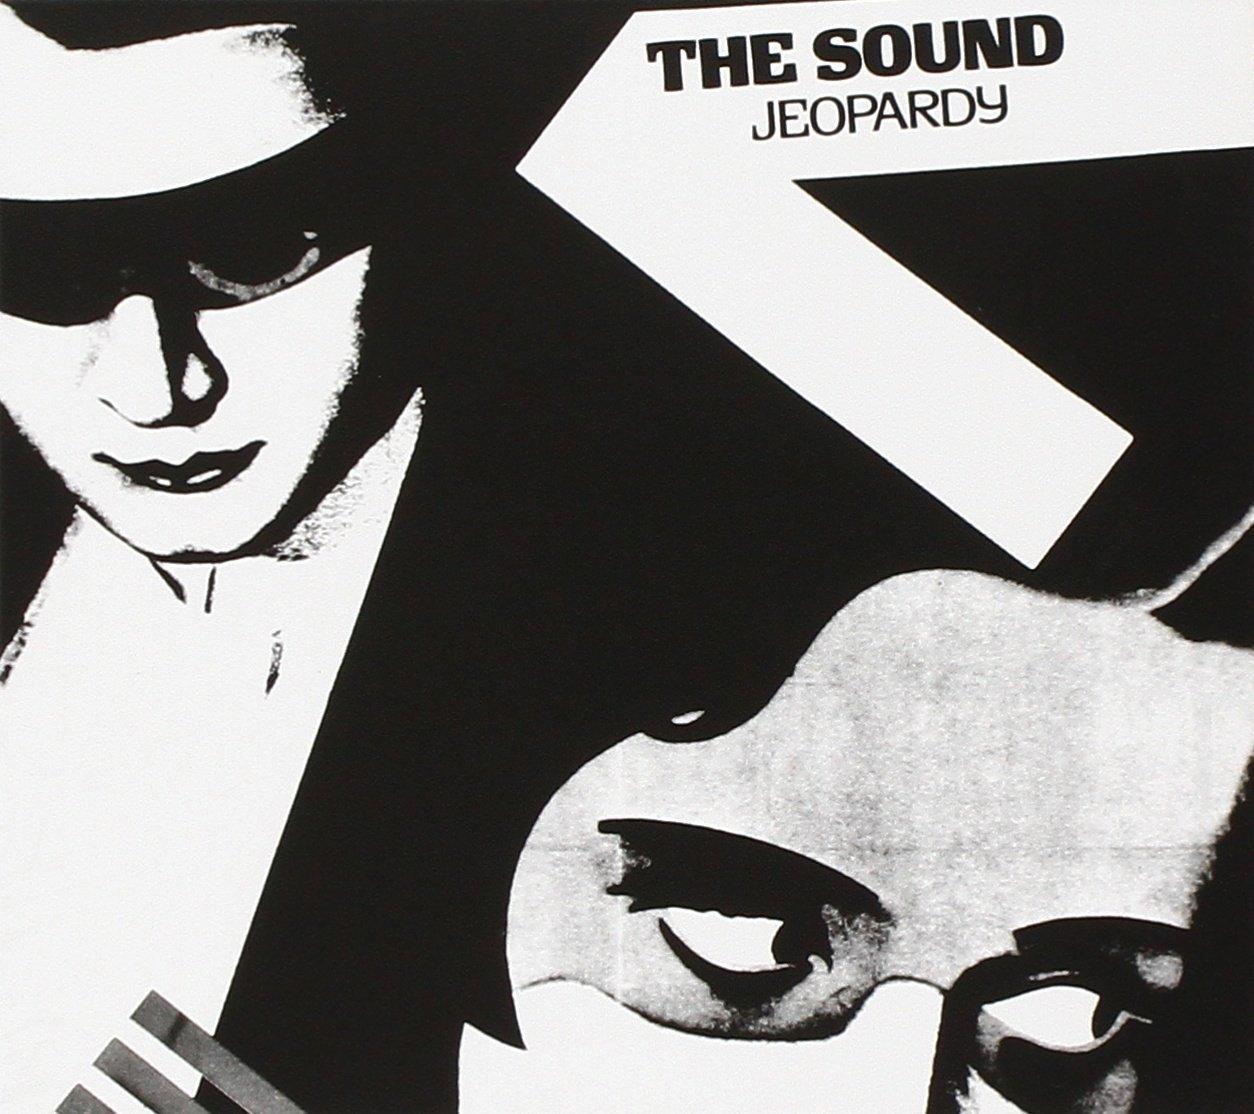 _ O _ P _ I _ U _ M __ H _ U _ M _: The Sound - Jeopardy (1980)